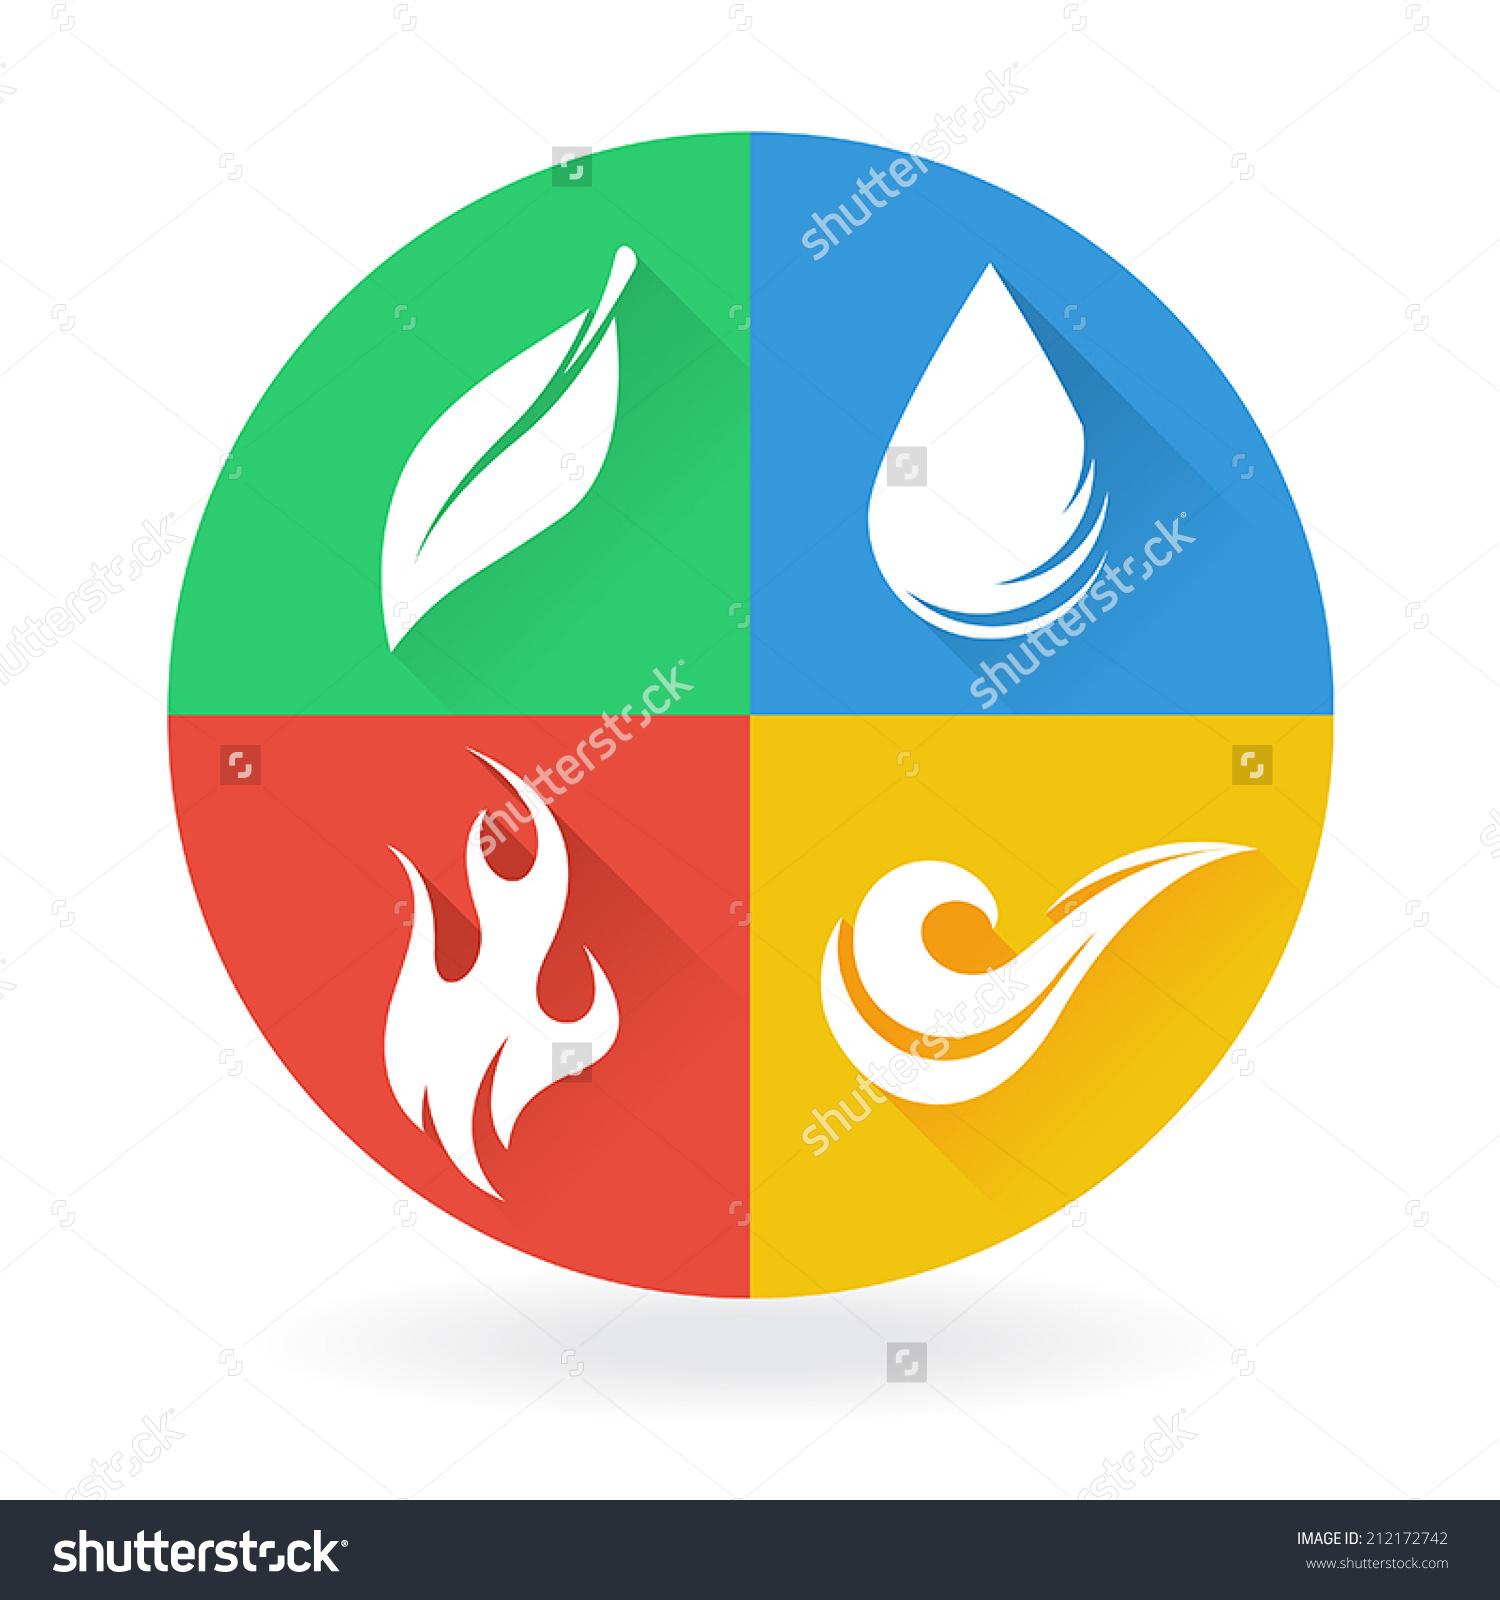 Earth Water Air Plant Clipart.